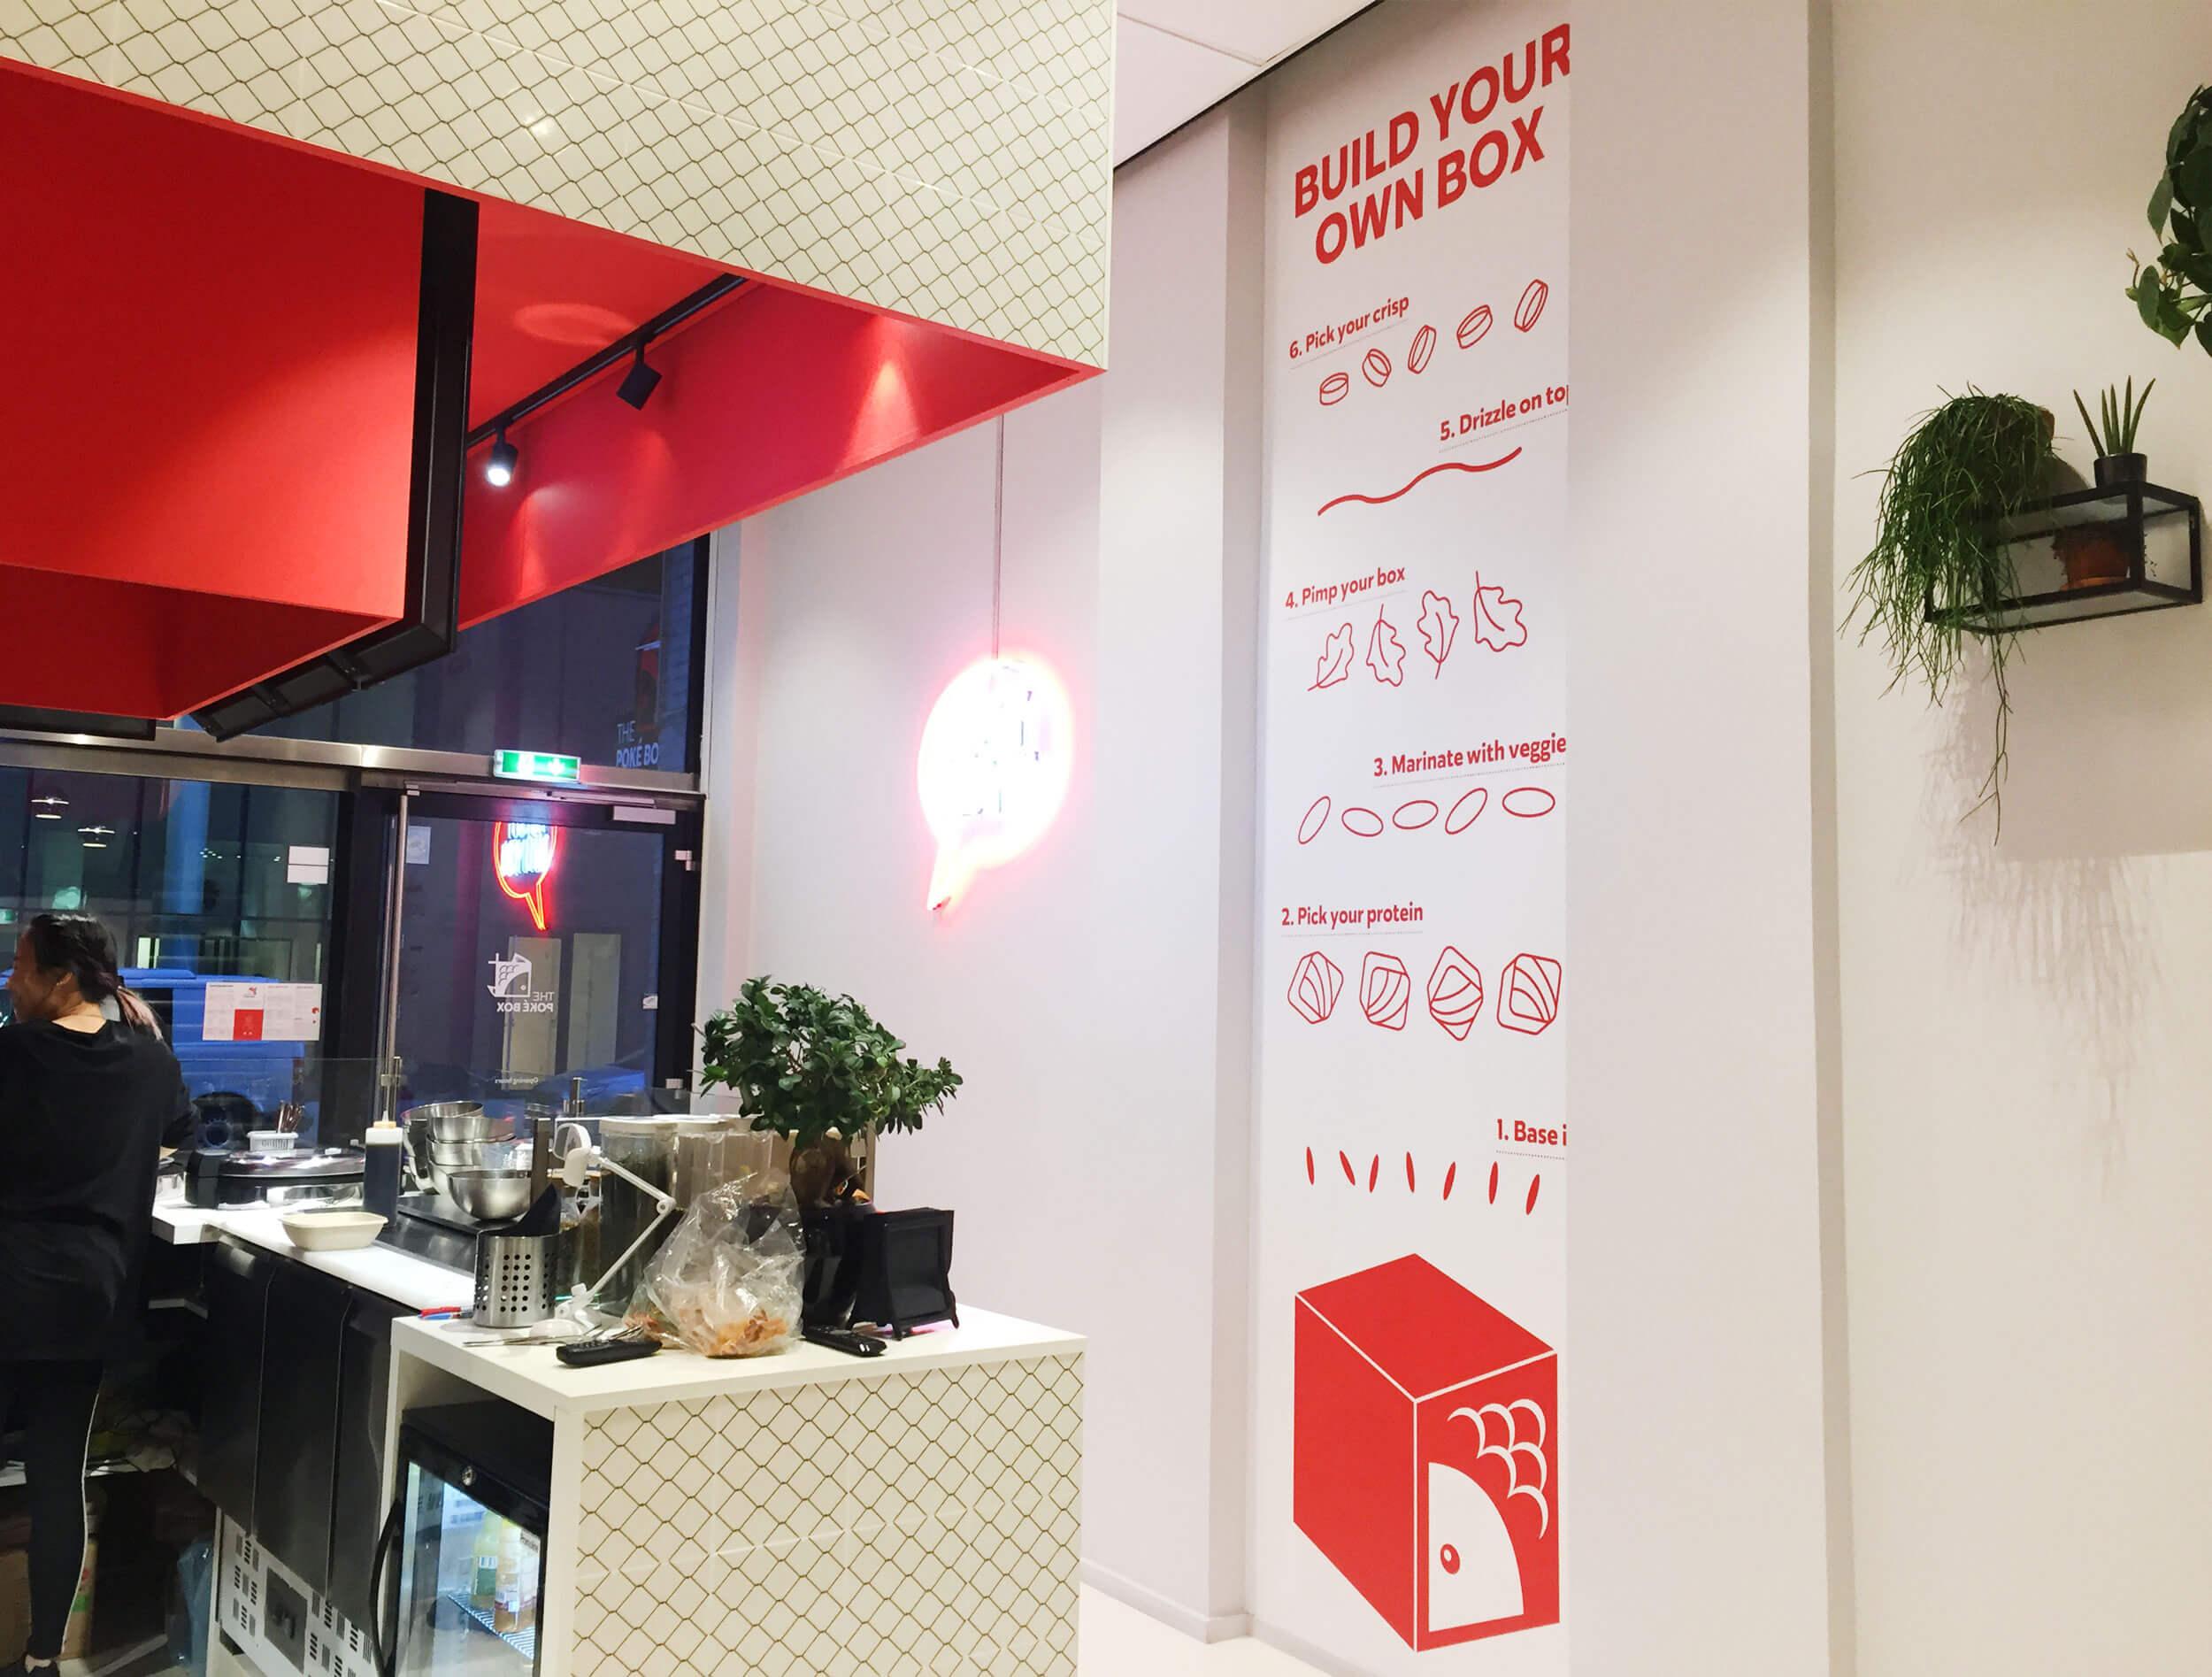 The Poké Box, stappenplan, Mixus studio